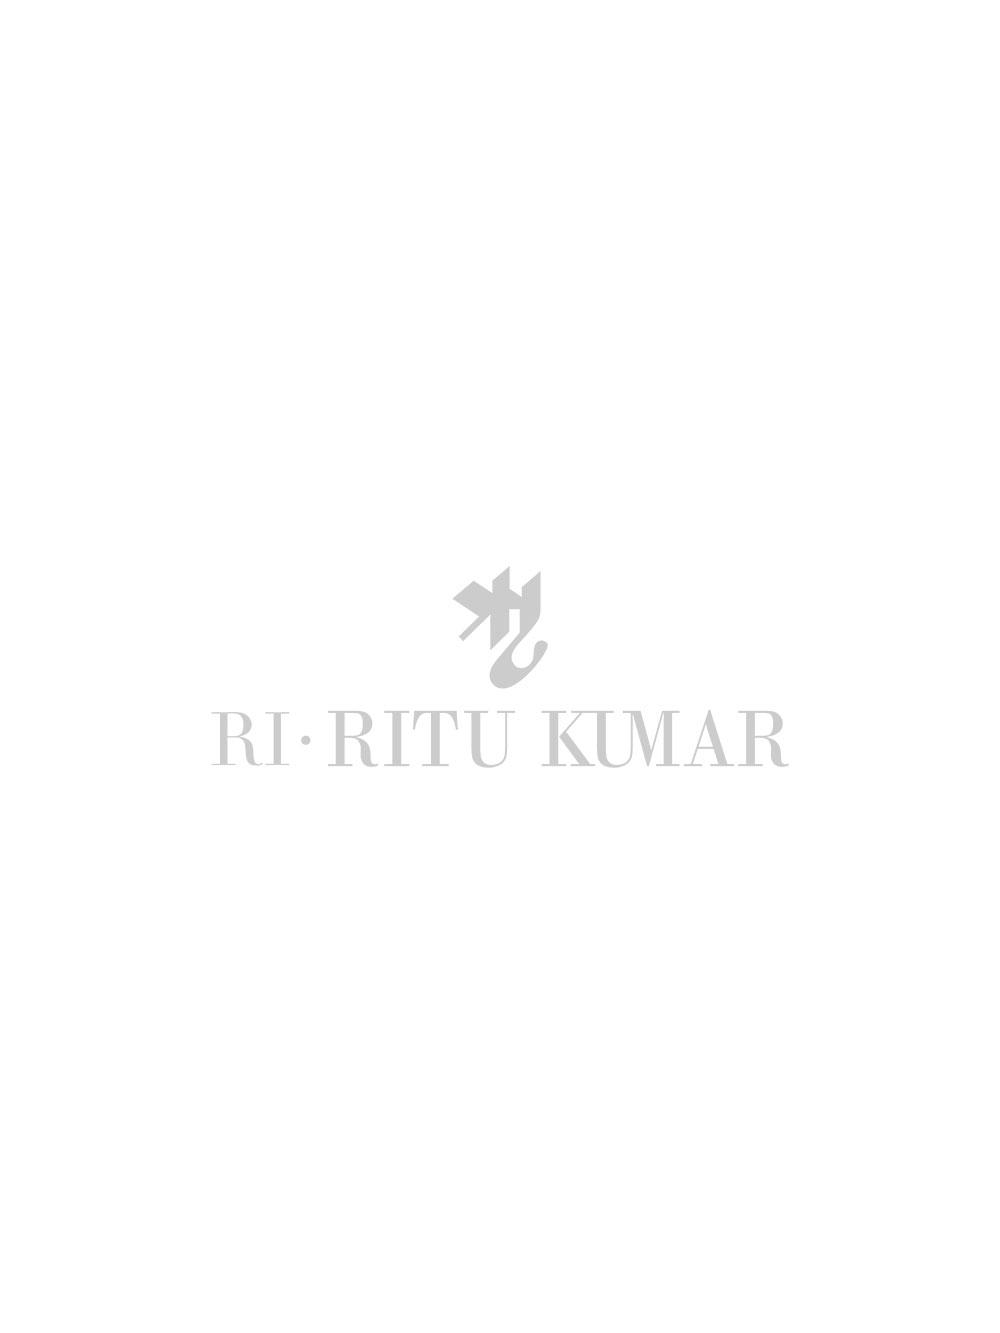 Royal blue printed and embroidered kurta with inner ,churidar and chunni